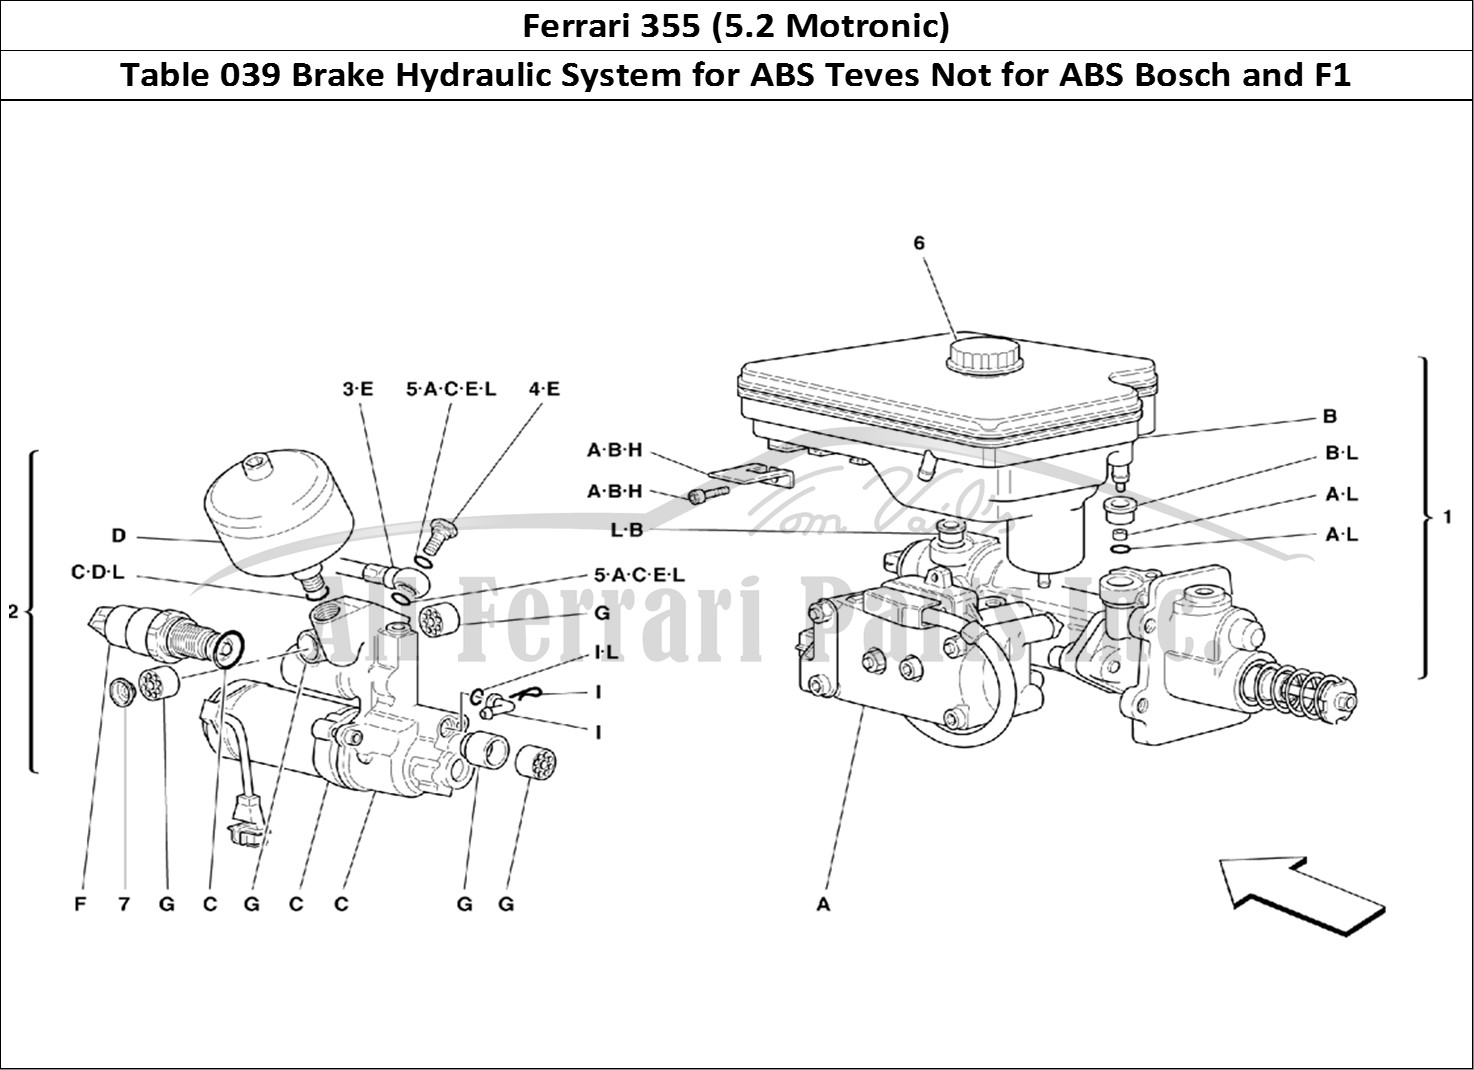 Buy original Ferrari 355 (5.2 Motronic) 039 Brake